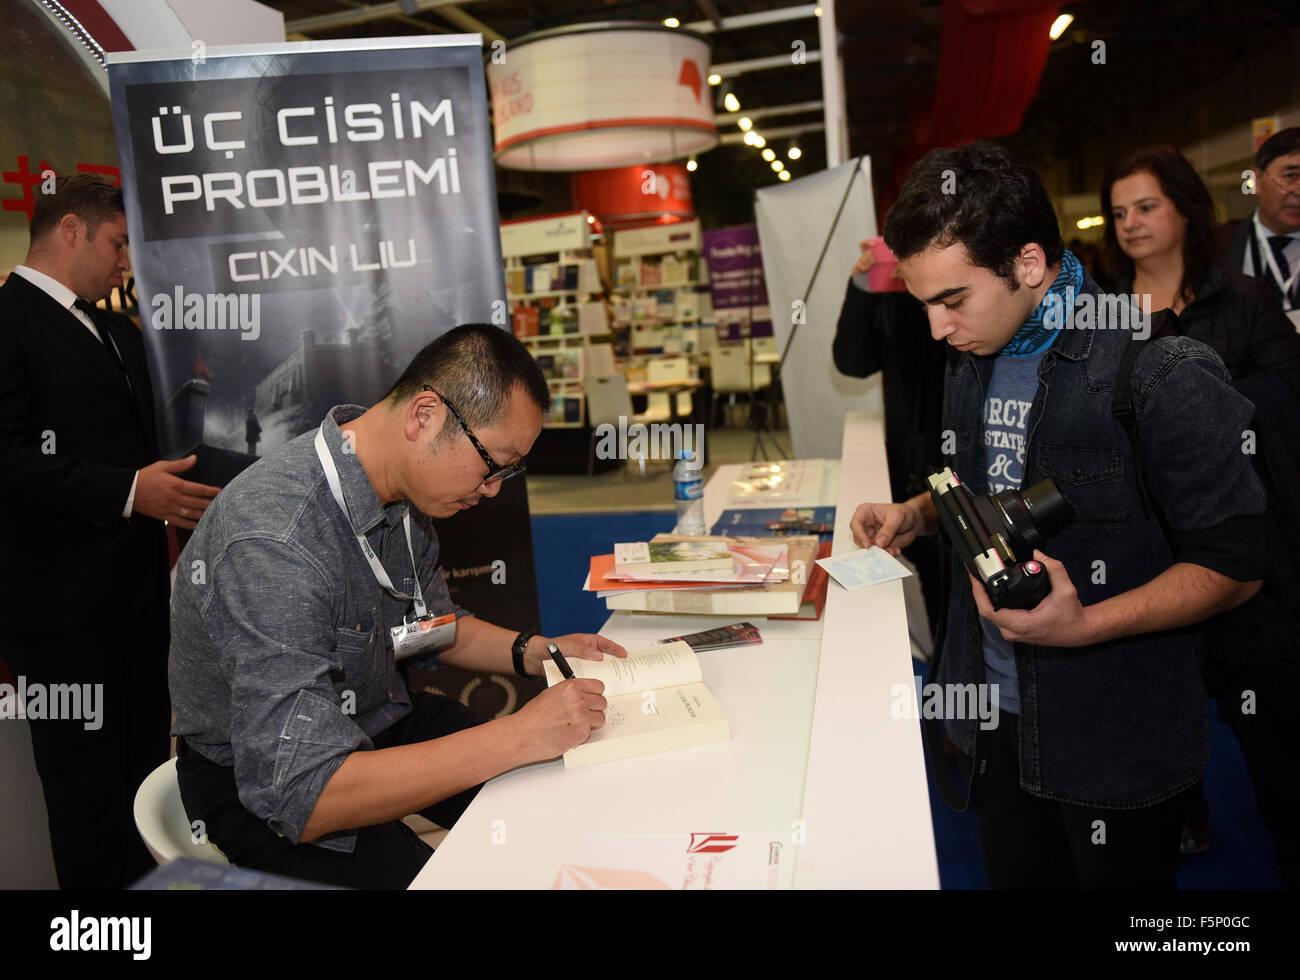 (151107) -- ISTANBUL, Nov. 7, 2015(Xinhua) -- Chinese sci-fi writer Liu Cixin (L) signs on his work 'The Three - Stock Image